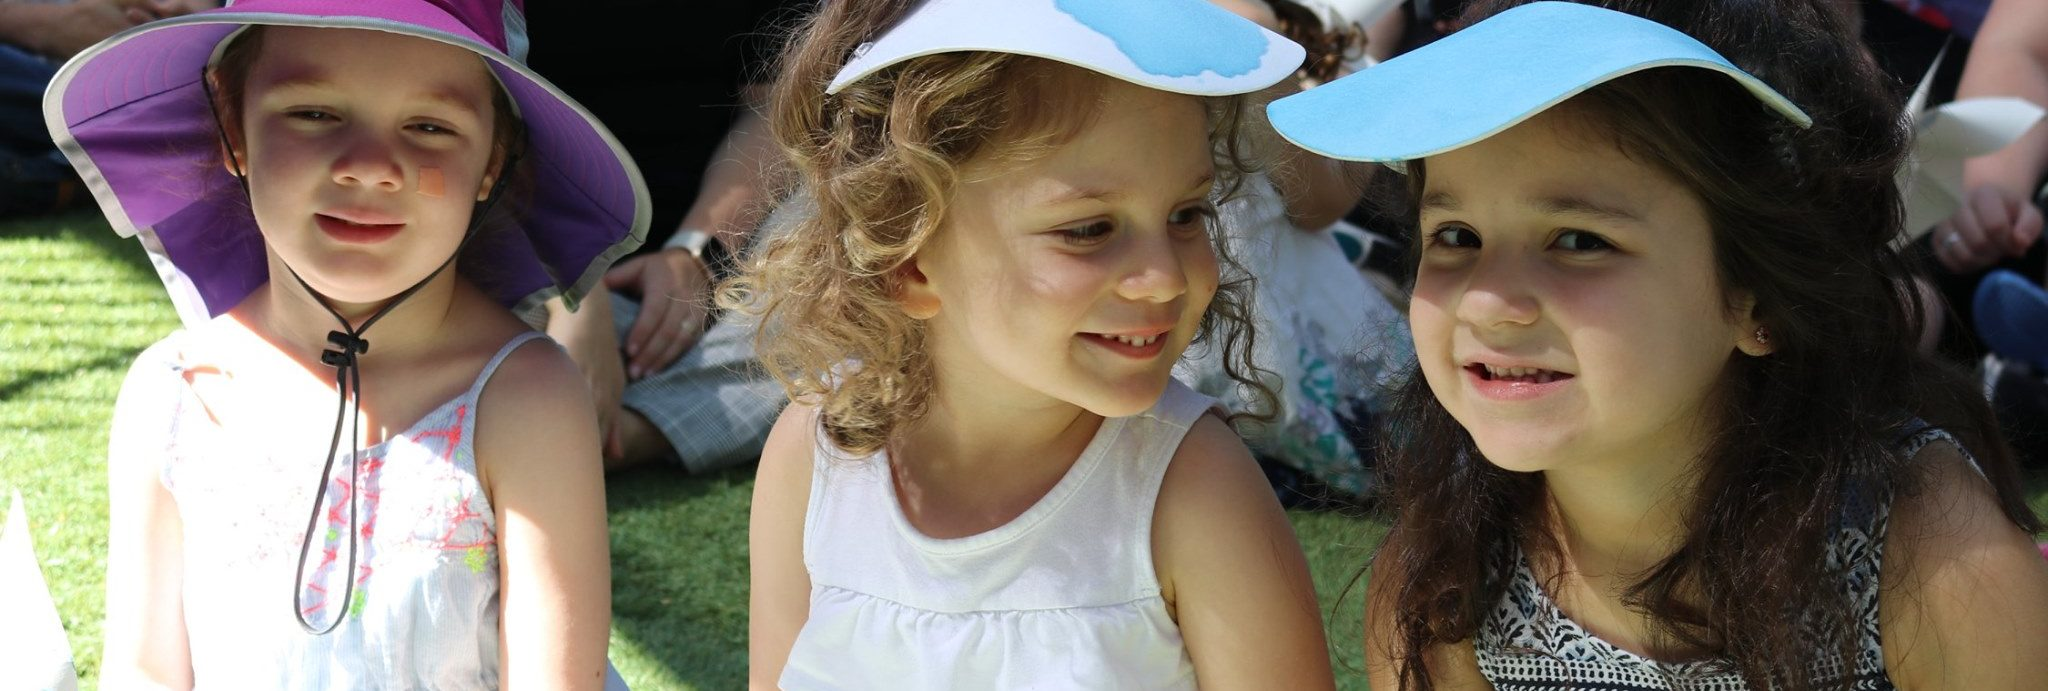 preschool-e1560536464634